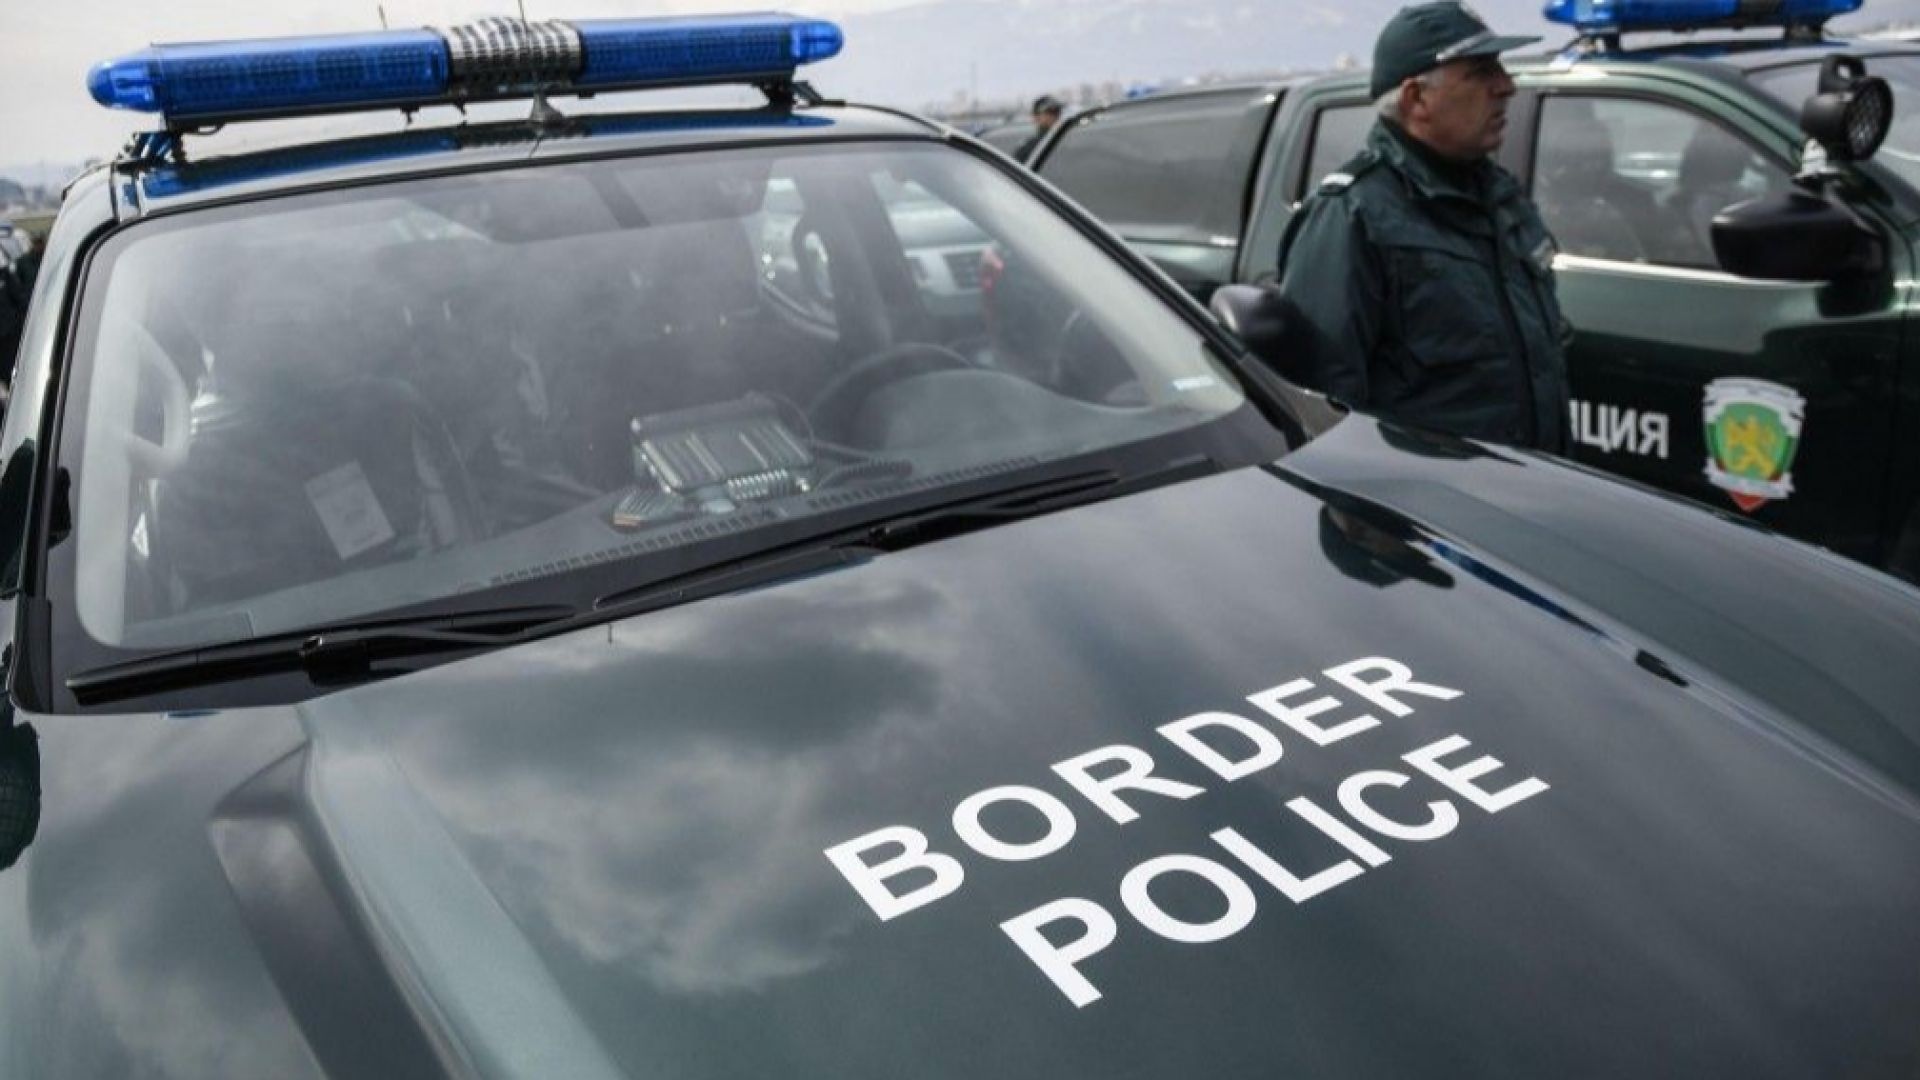 Шефът на Гранична полиция: Няма пропуск в случая с непроверения самолет